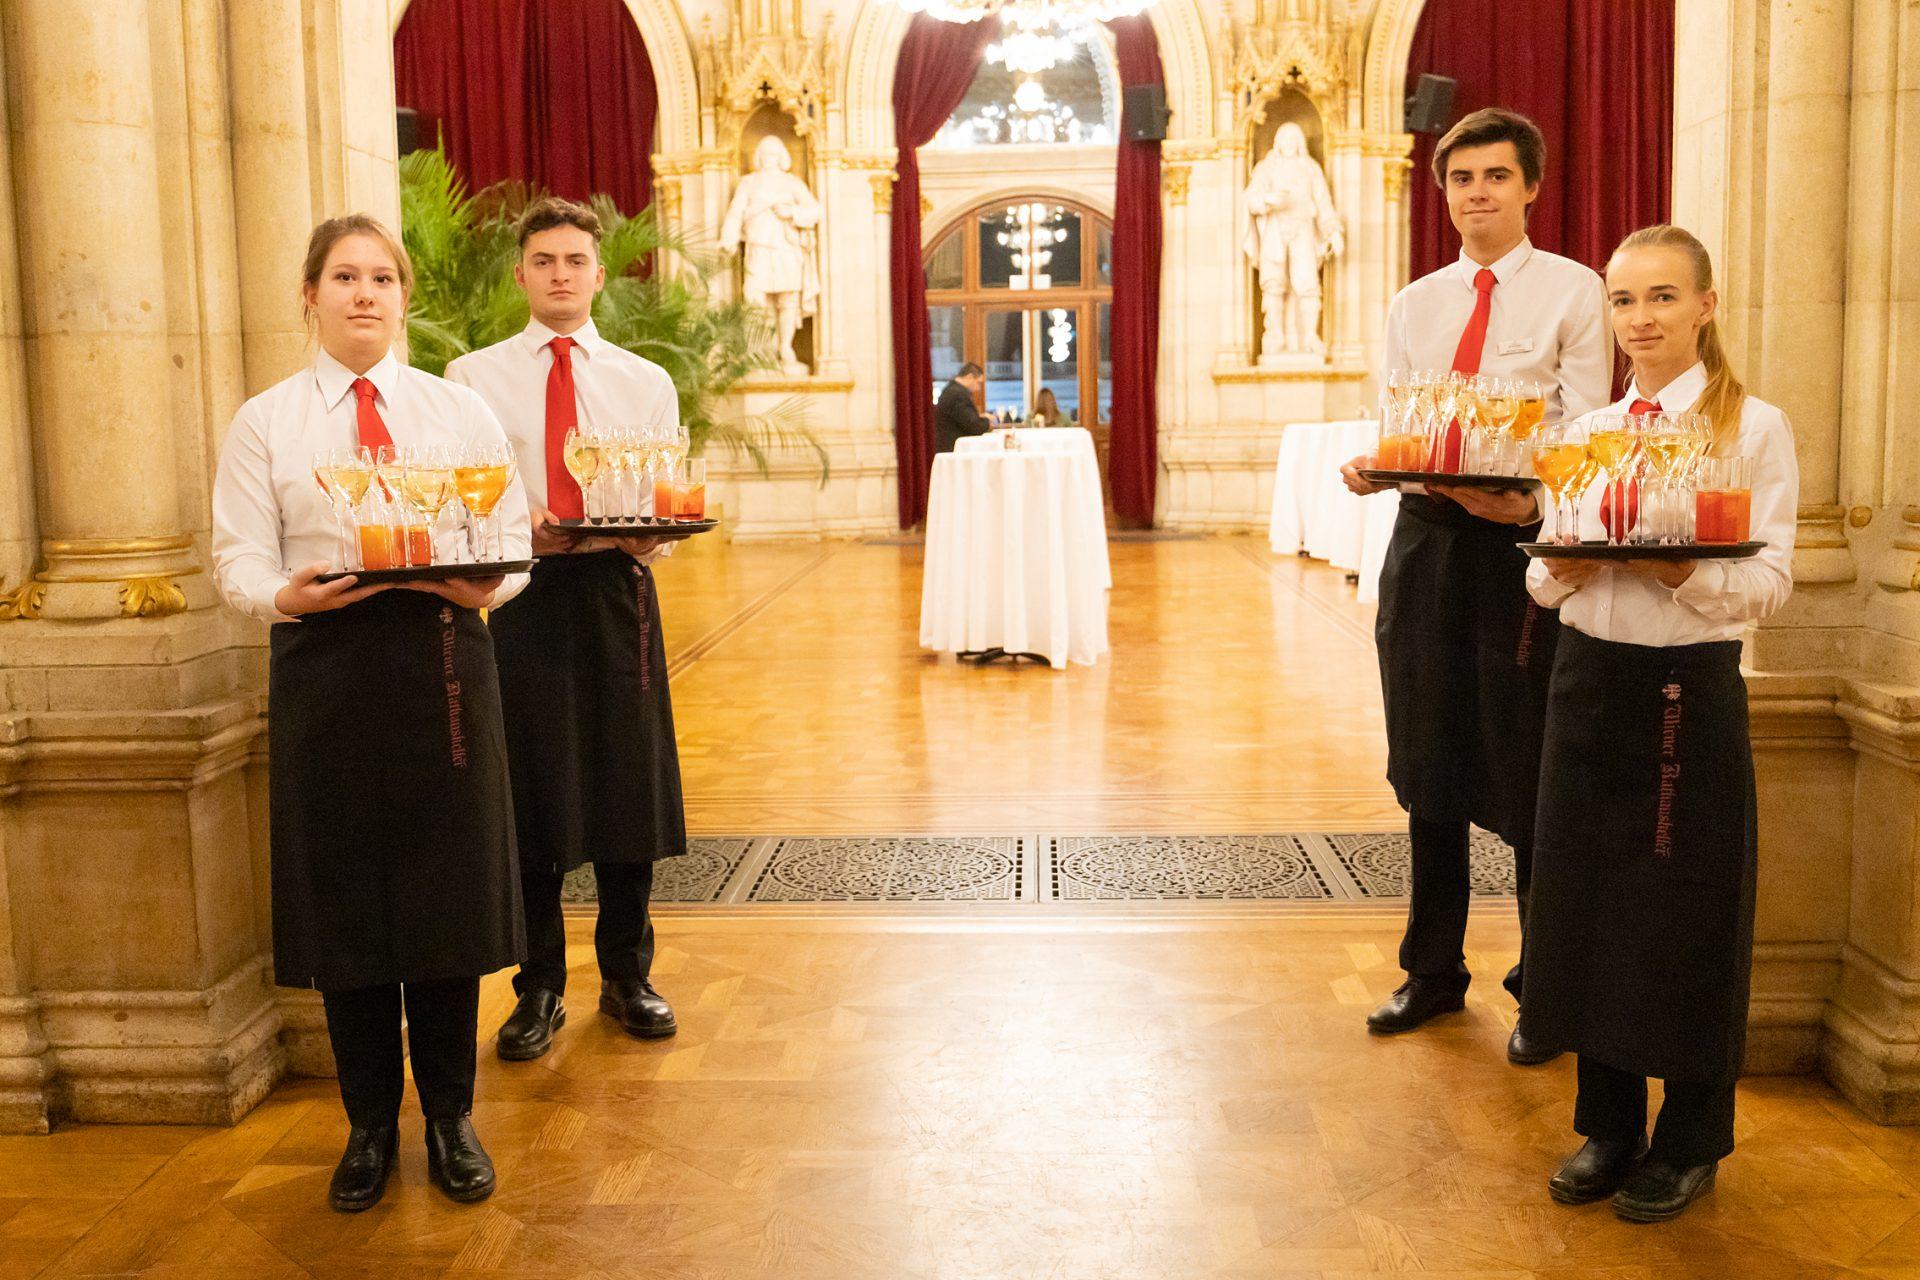 6H5A7562_20191129_CEMS_ANNUAL_EVENTS_2019_VIENNA